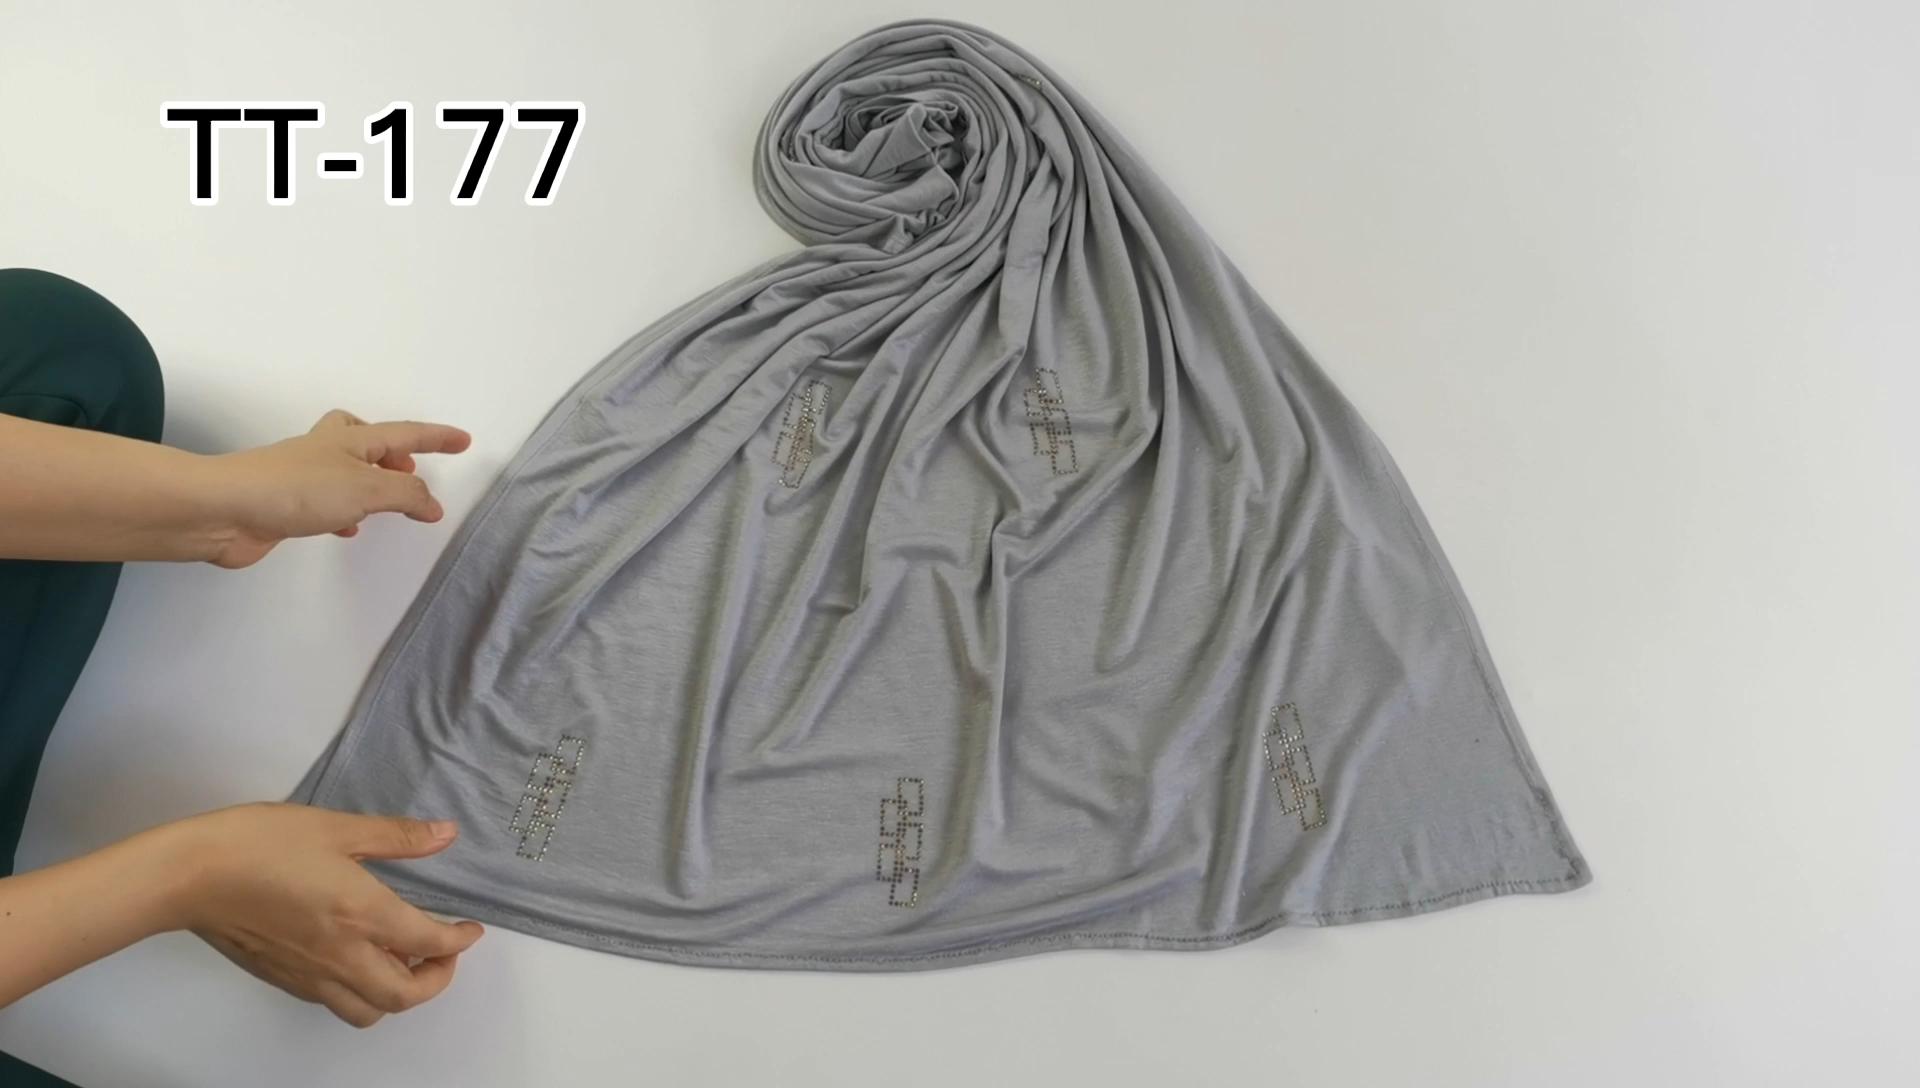 newest design high quality fashion palostani  Muslim women hijab cotton scarf